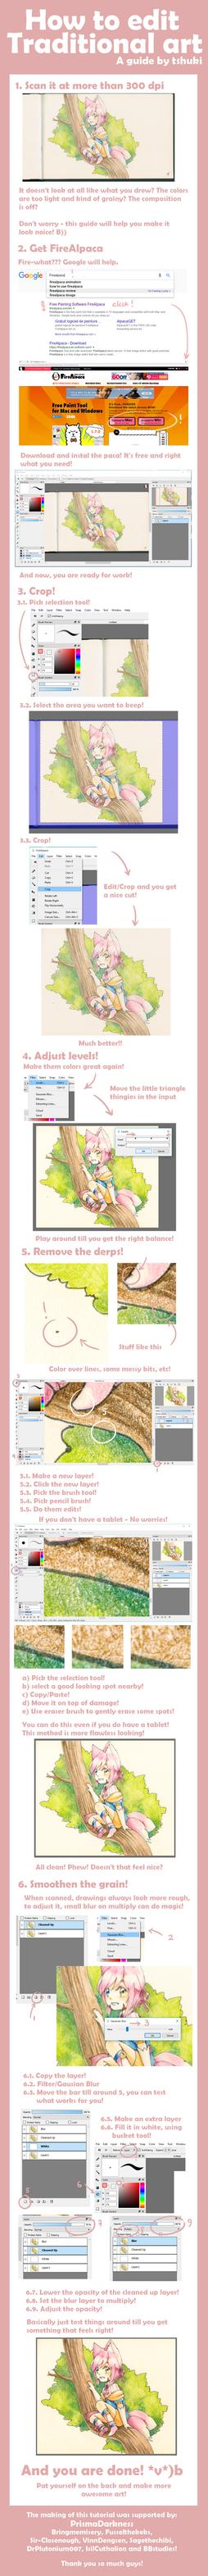 [Tutorial] How to edit traditional art! by tshuki